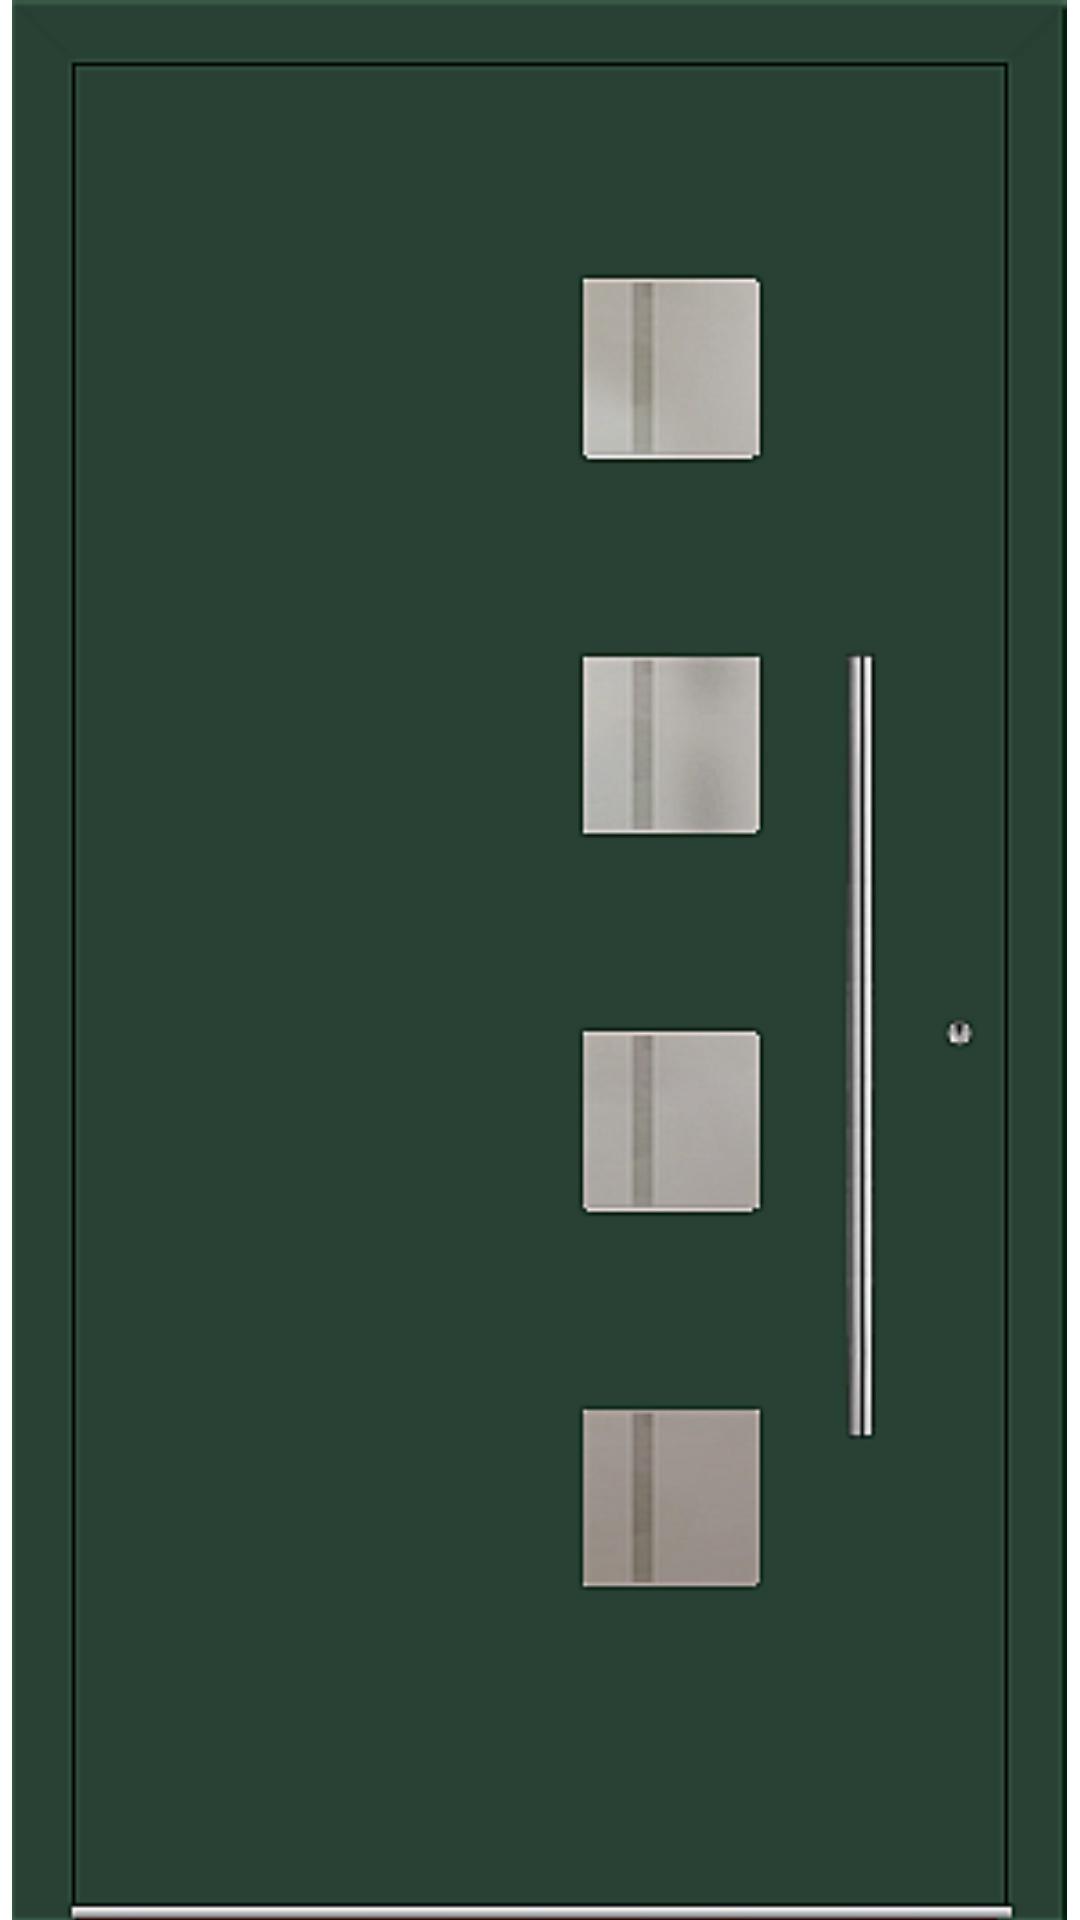 PaXentree Aluminium Haustür M04420 moosgrün